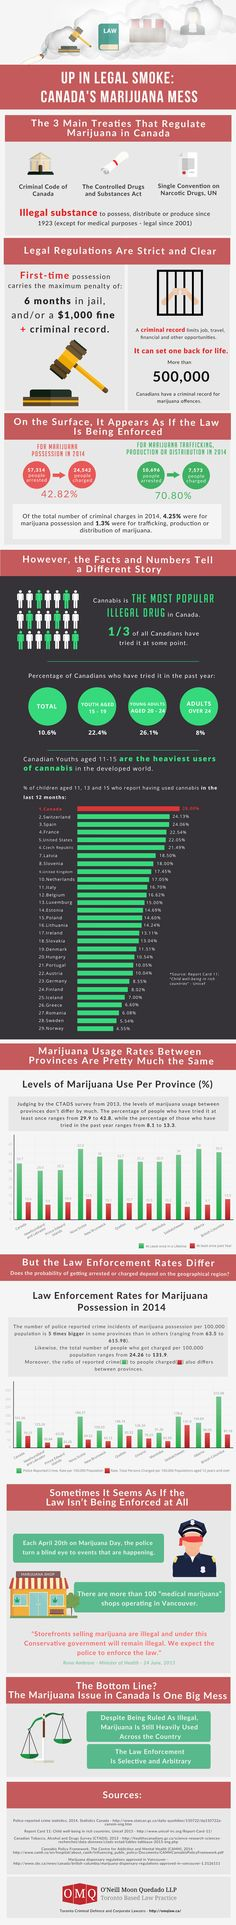 Up in Legal Smoke: Canada's Marijuana Mess #infographic #Drugs #Marijuana